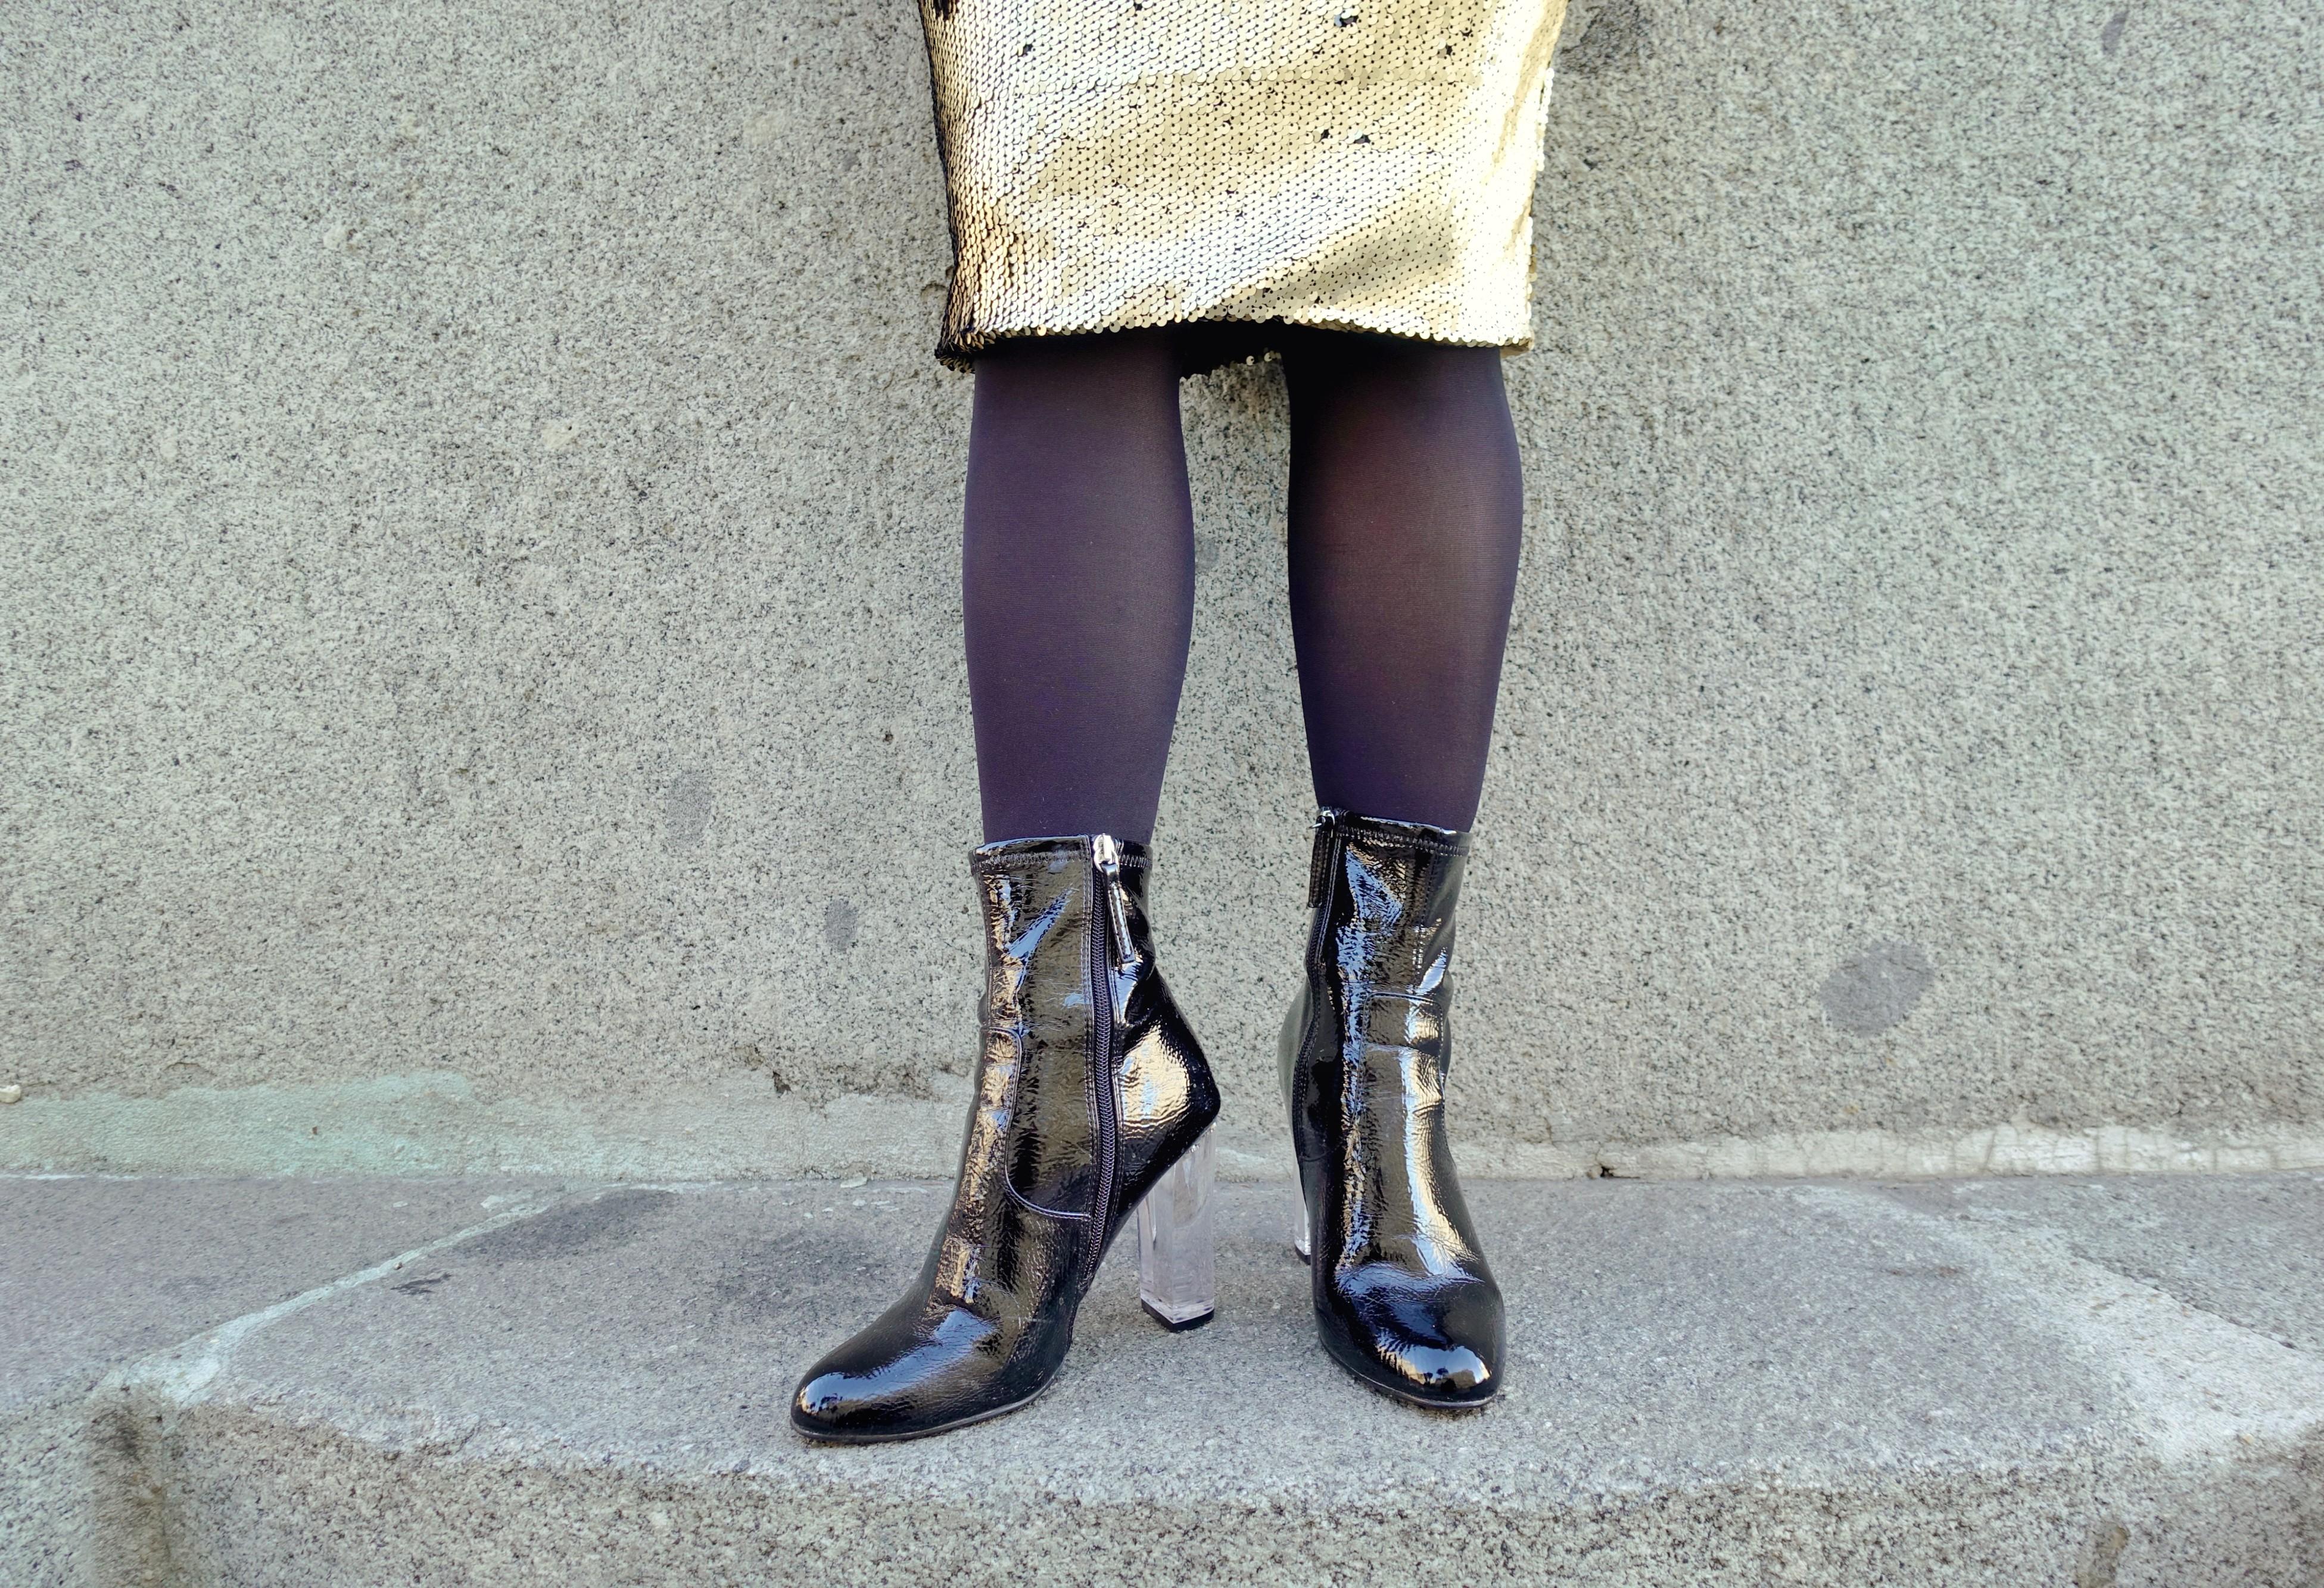 Botines-steve-madden-falda-dorada-okeysi-gold-look-influencer-ChicAdicta-blog-de-moda-Chic-Adicta-PiensaenChic-Piensa-en-Chic